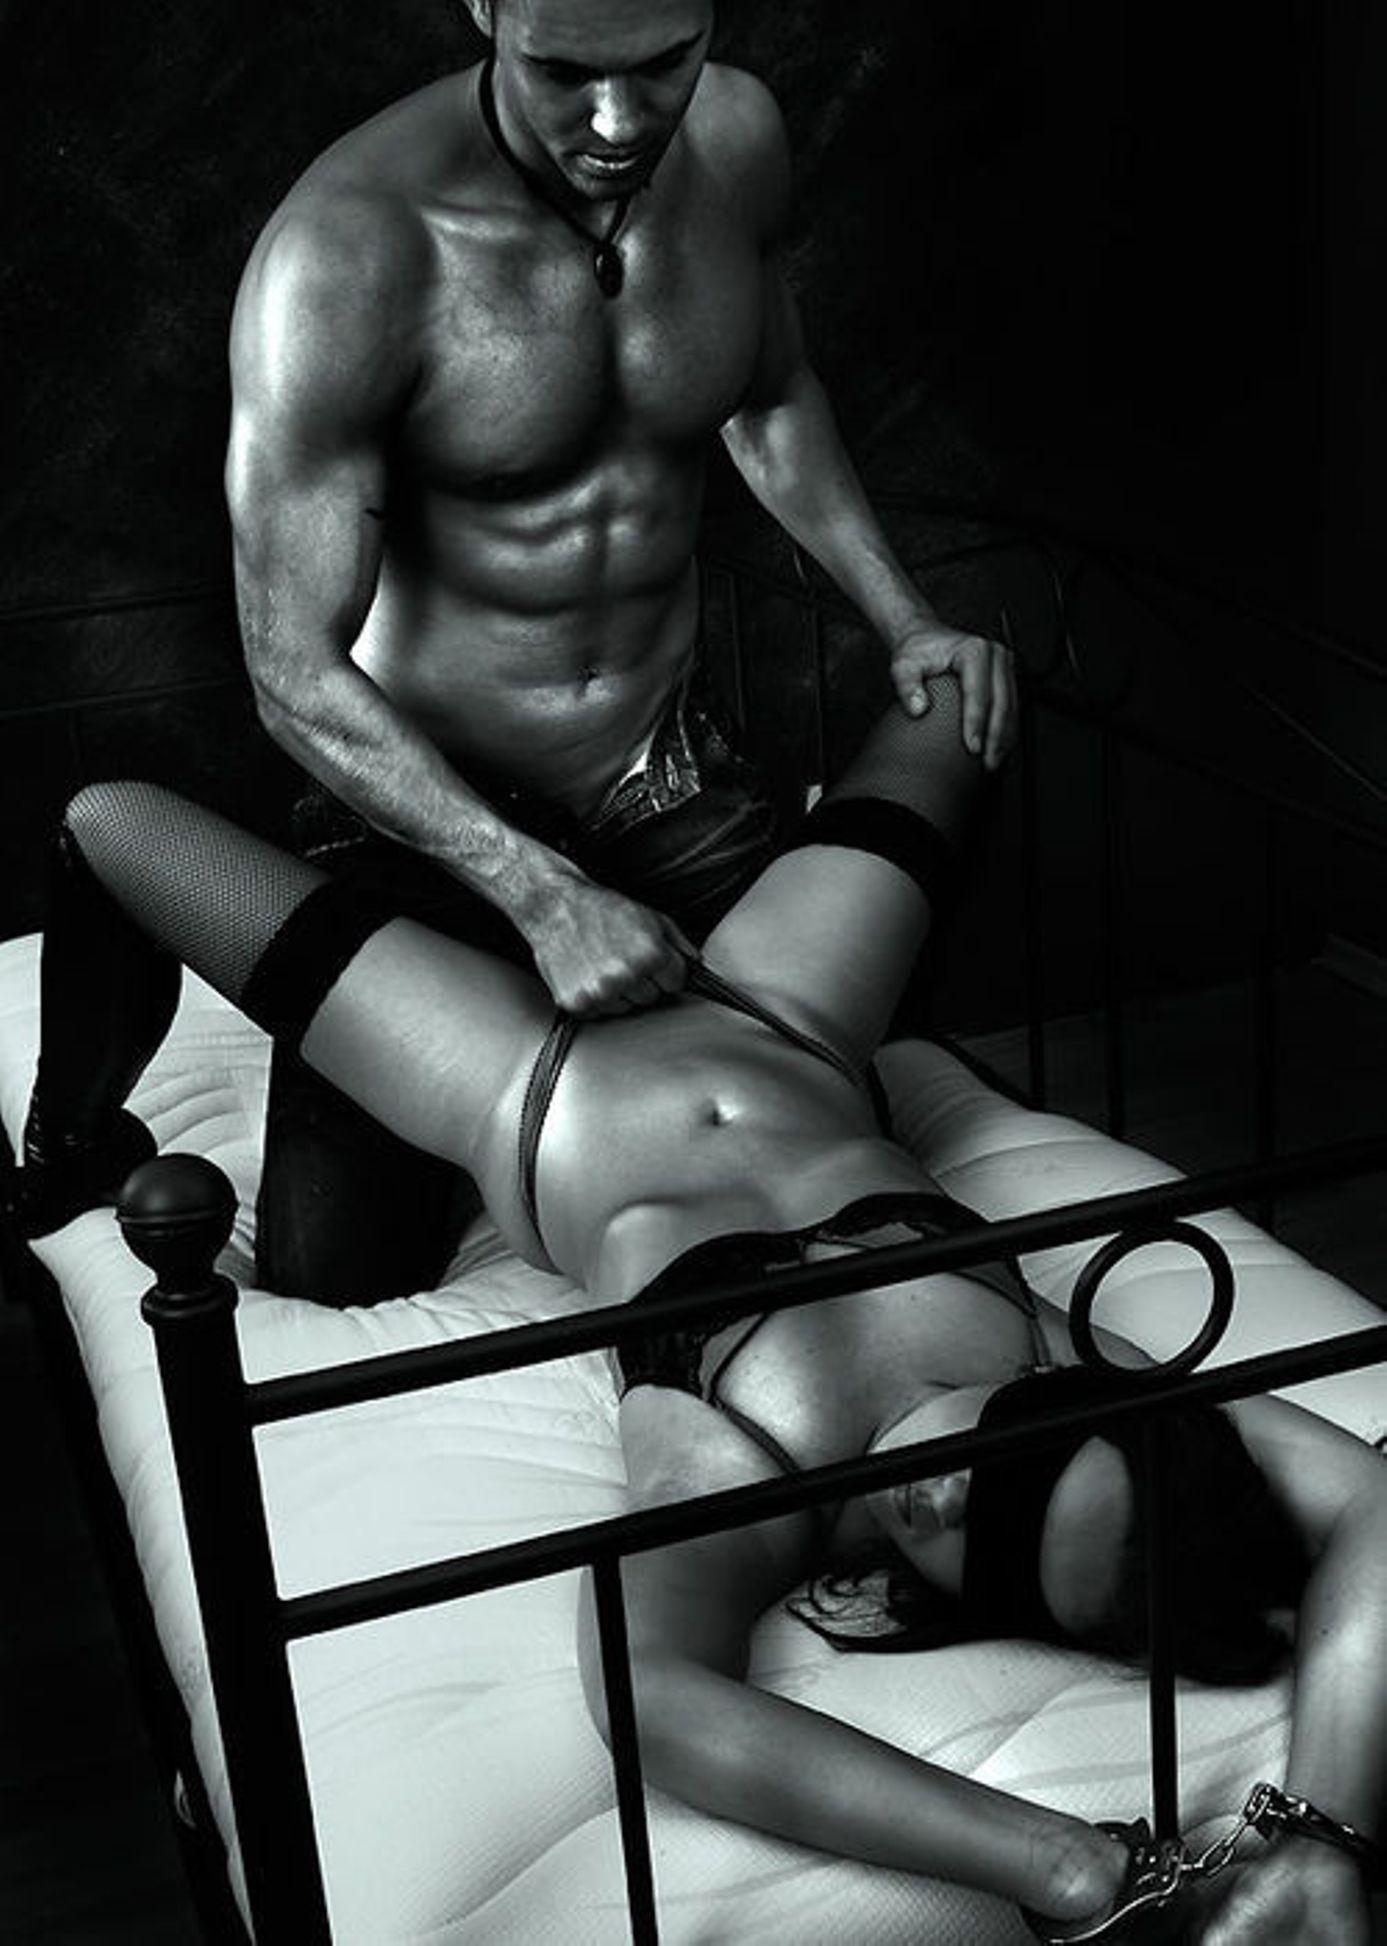 Фото секс з наручниками 23 фотография